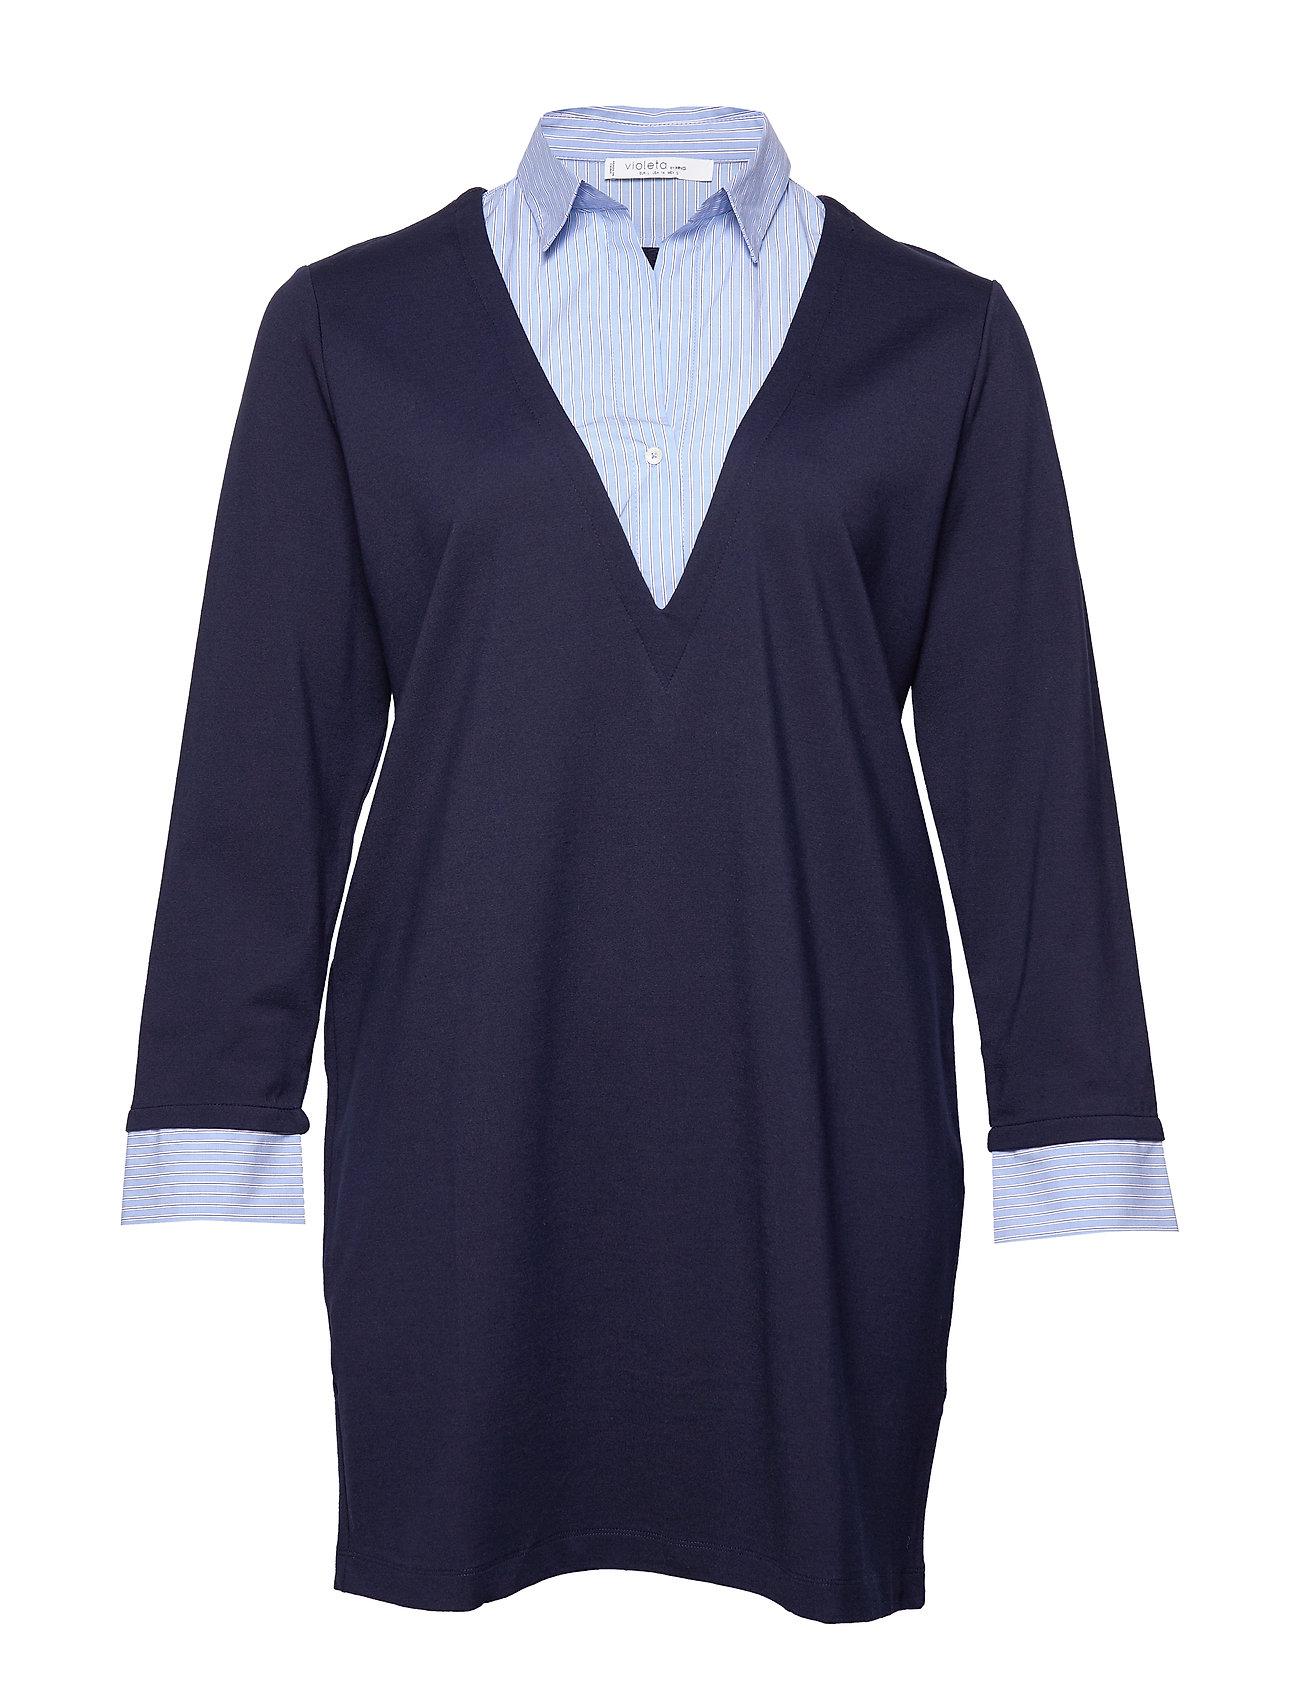 Violeta by Mango Combined shirt dress - NAVY